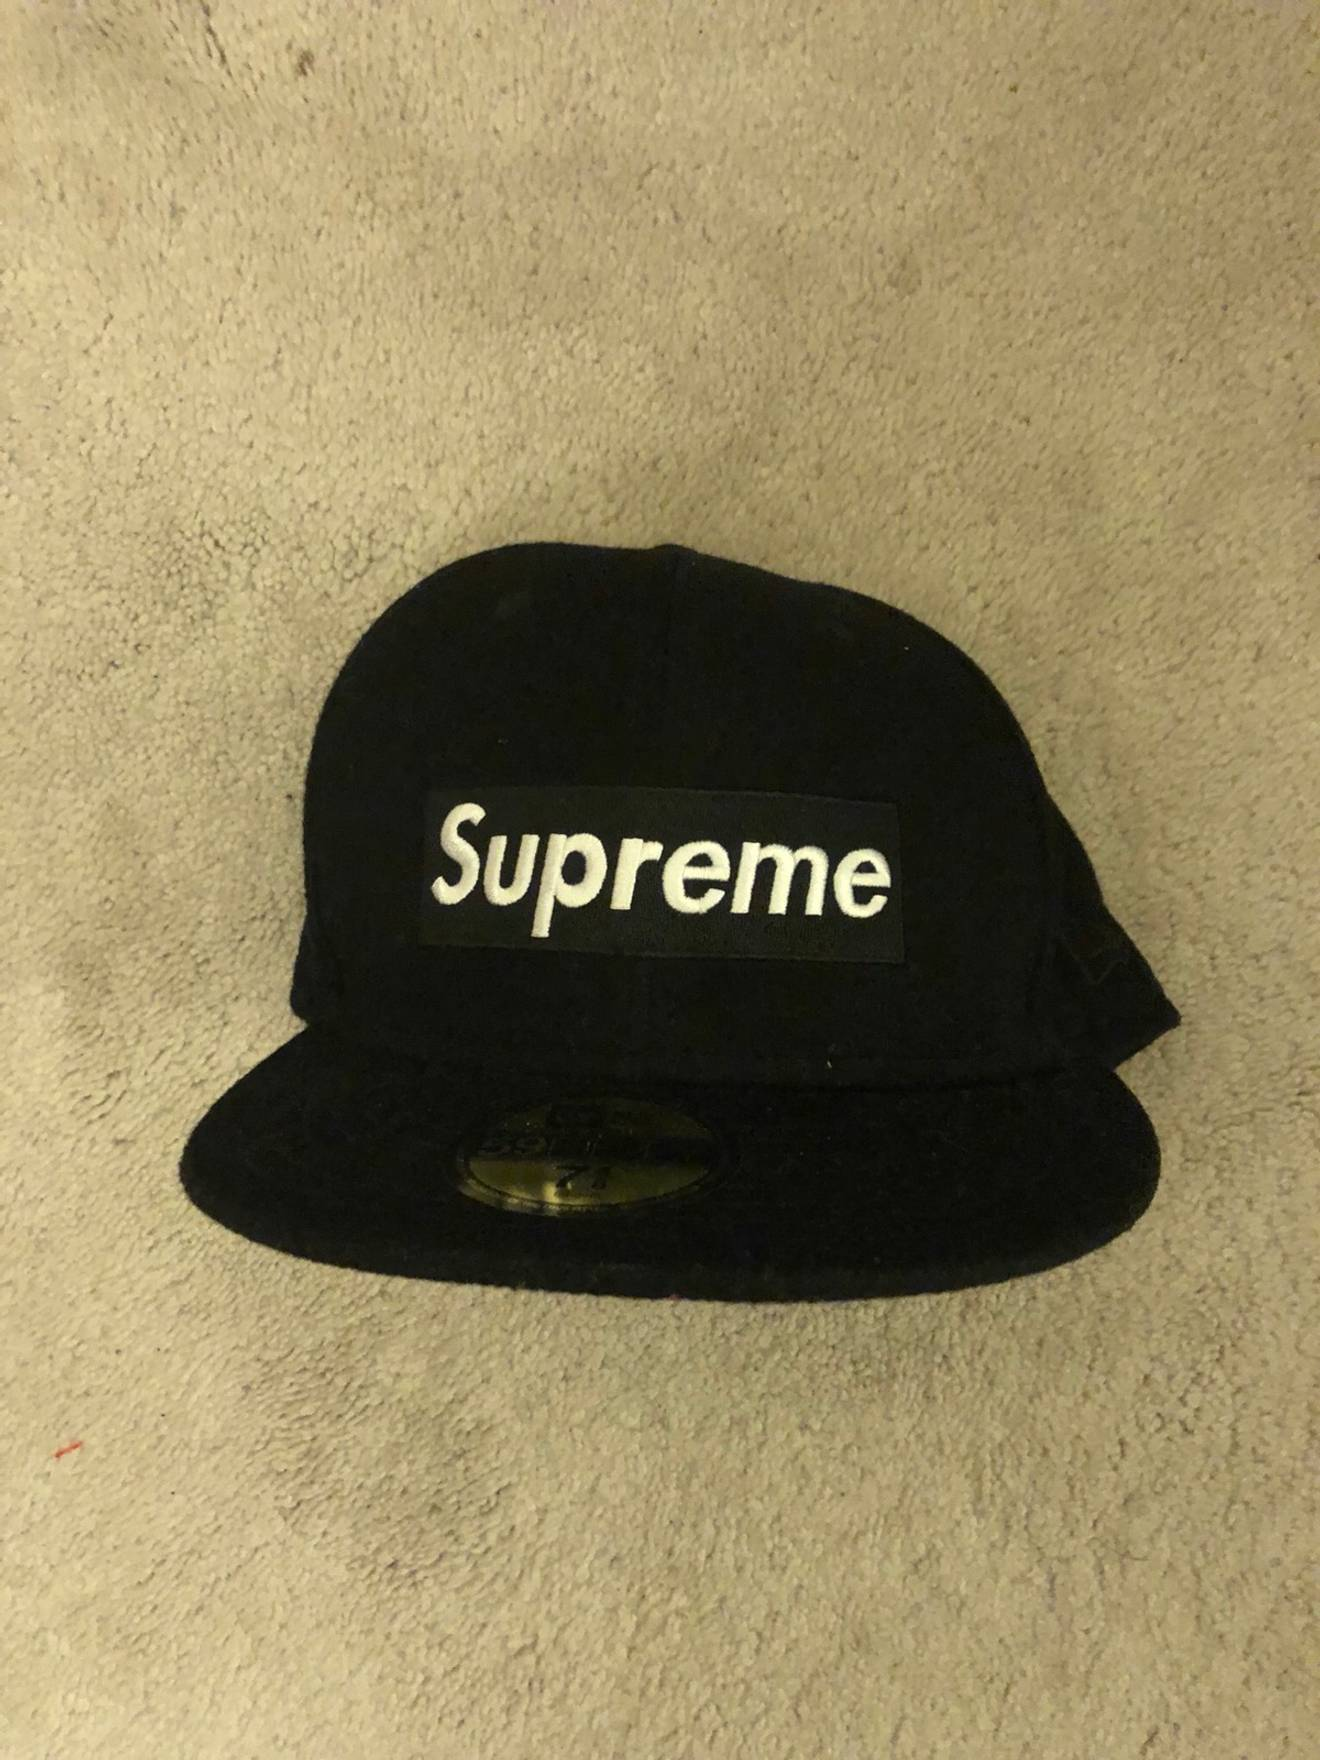 857585ead1f ... low cost supreme supreme new era hat size one size 2130c d5168